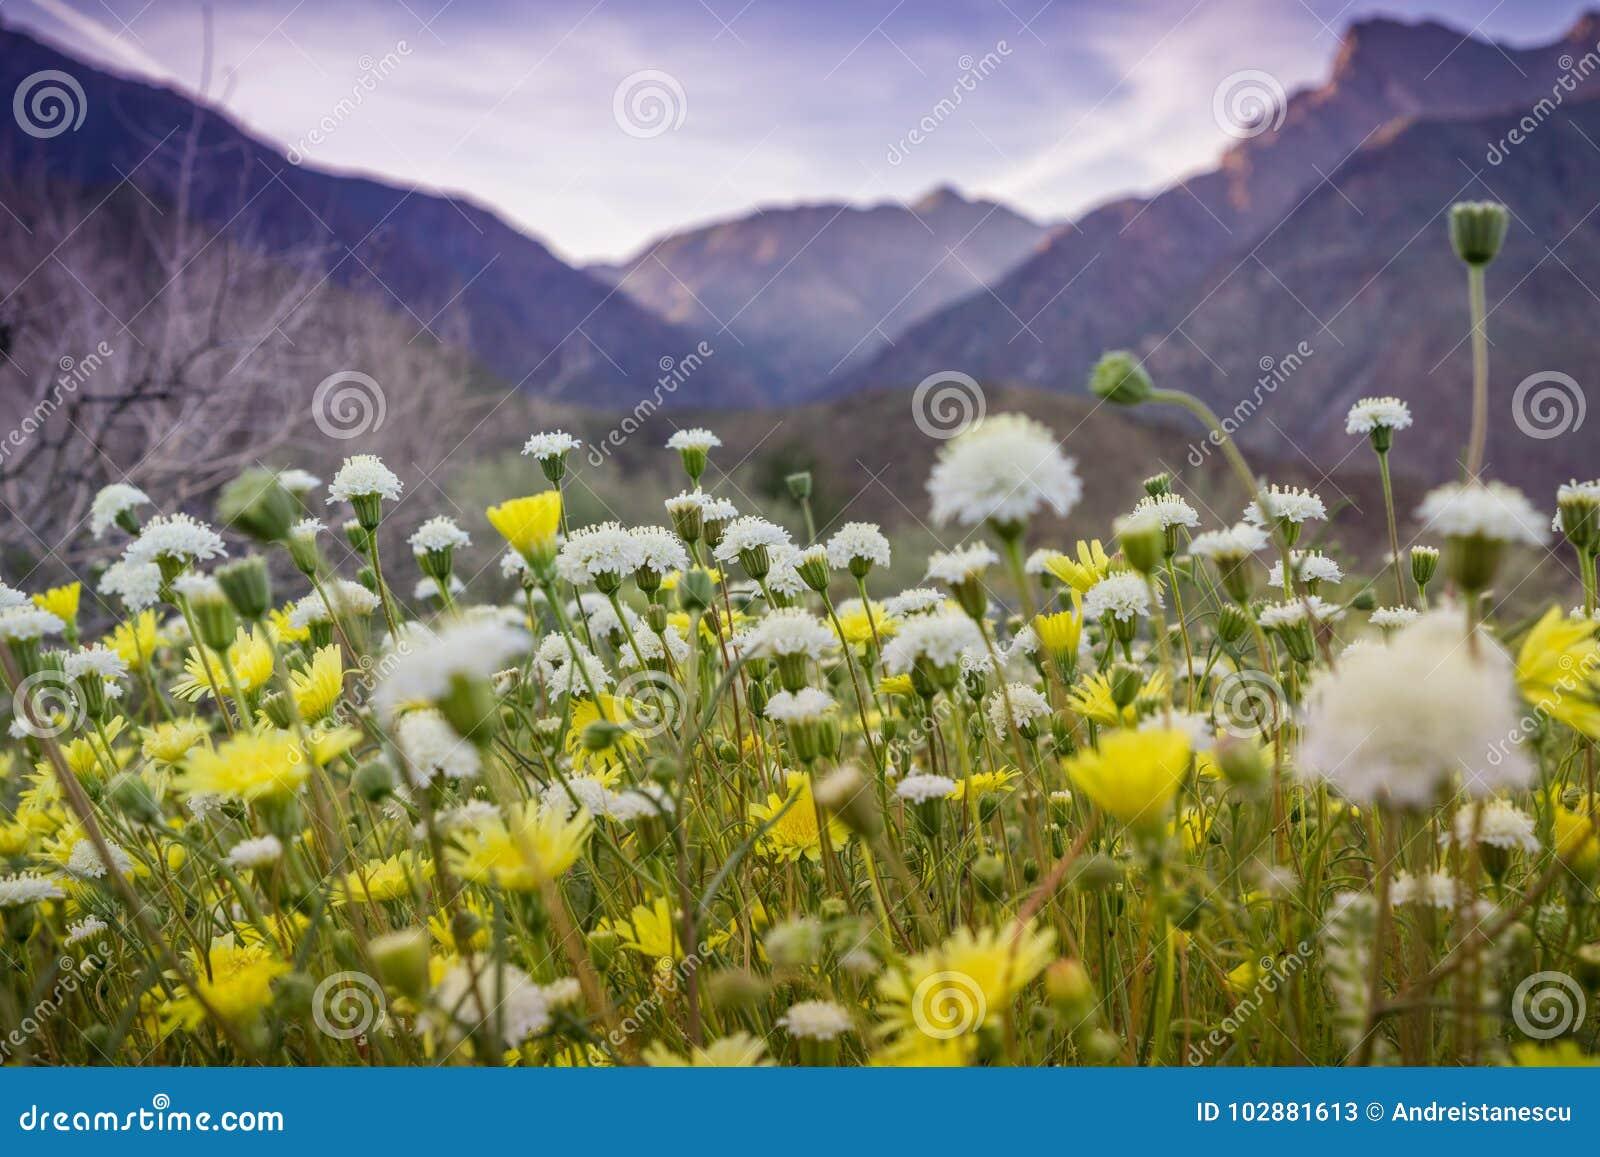 Landscape in Anza Borrego Desert State Park during a spring super bloom, California